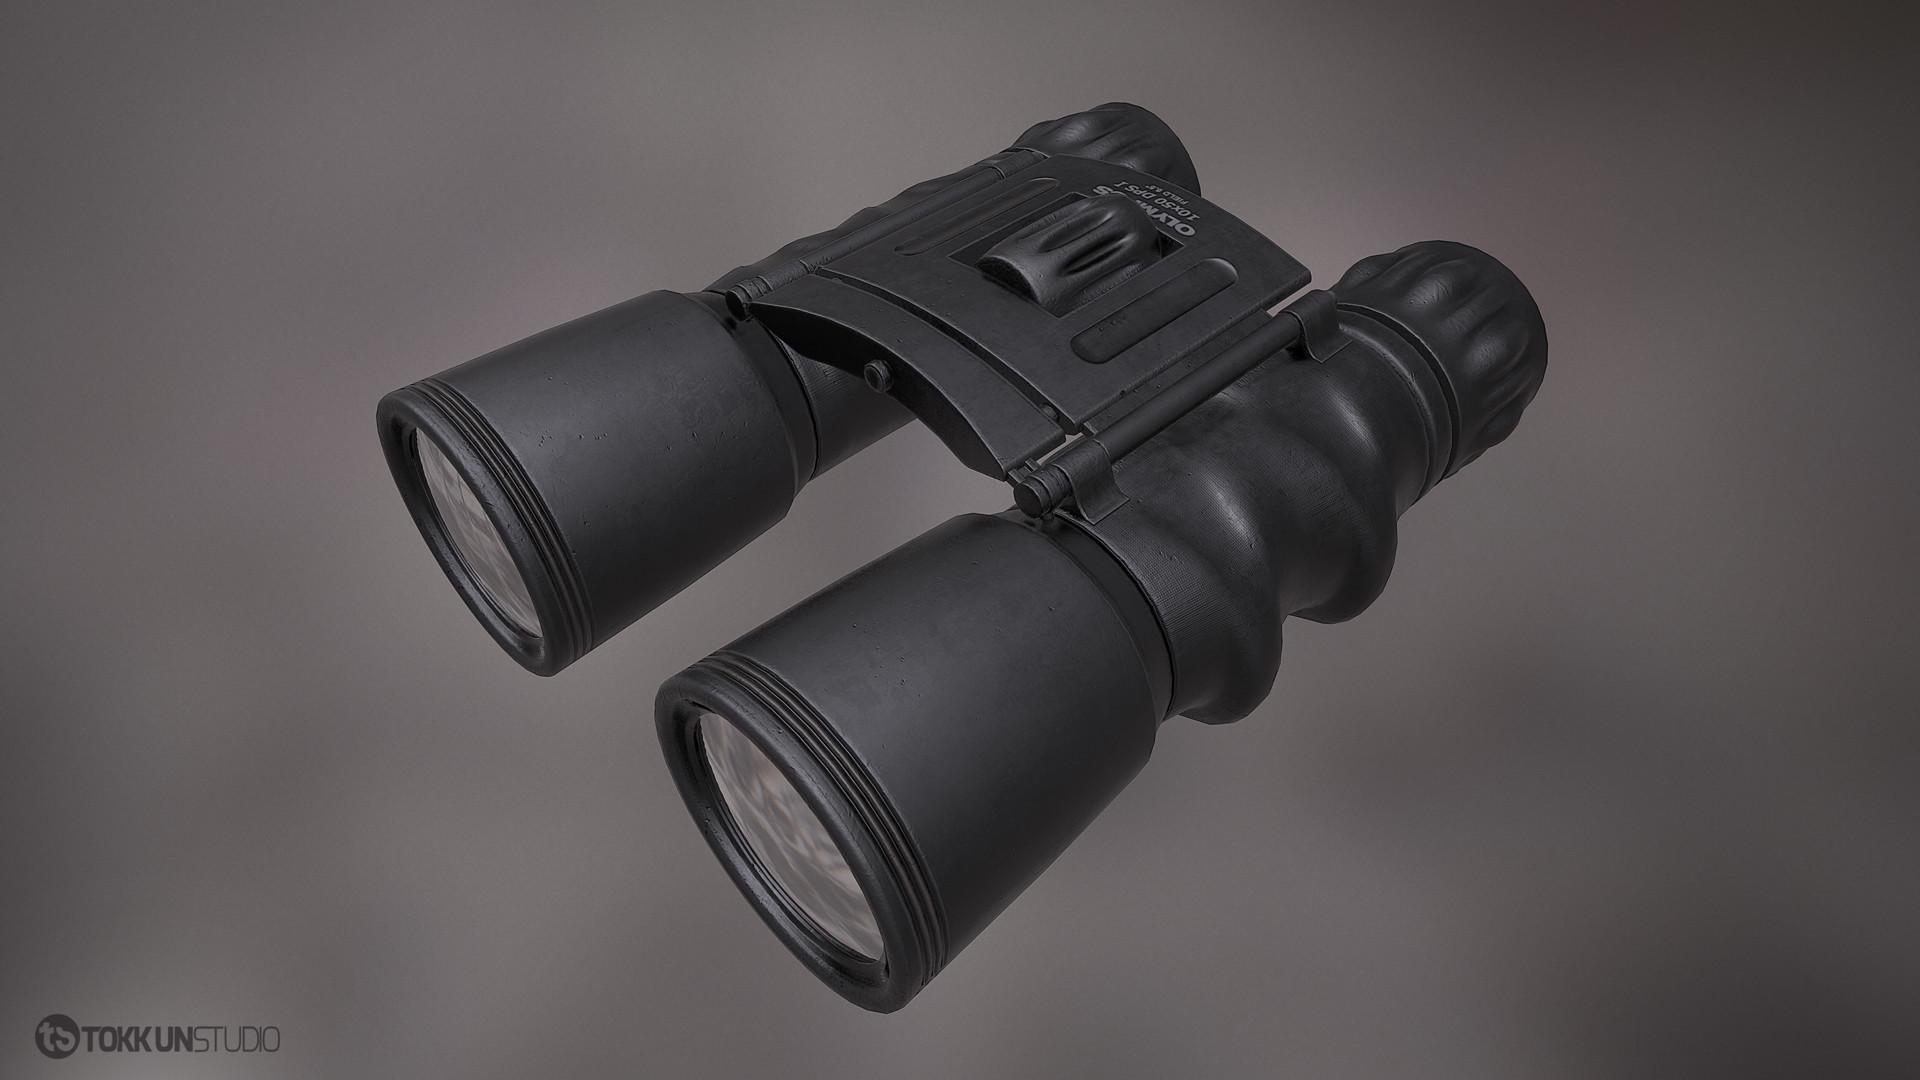 Tokkun studio binocular 1ts